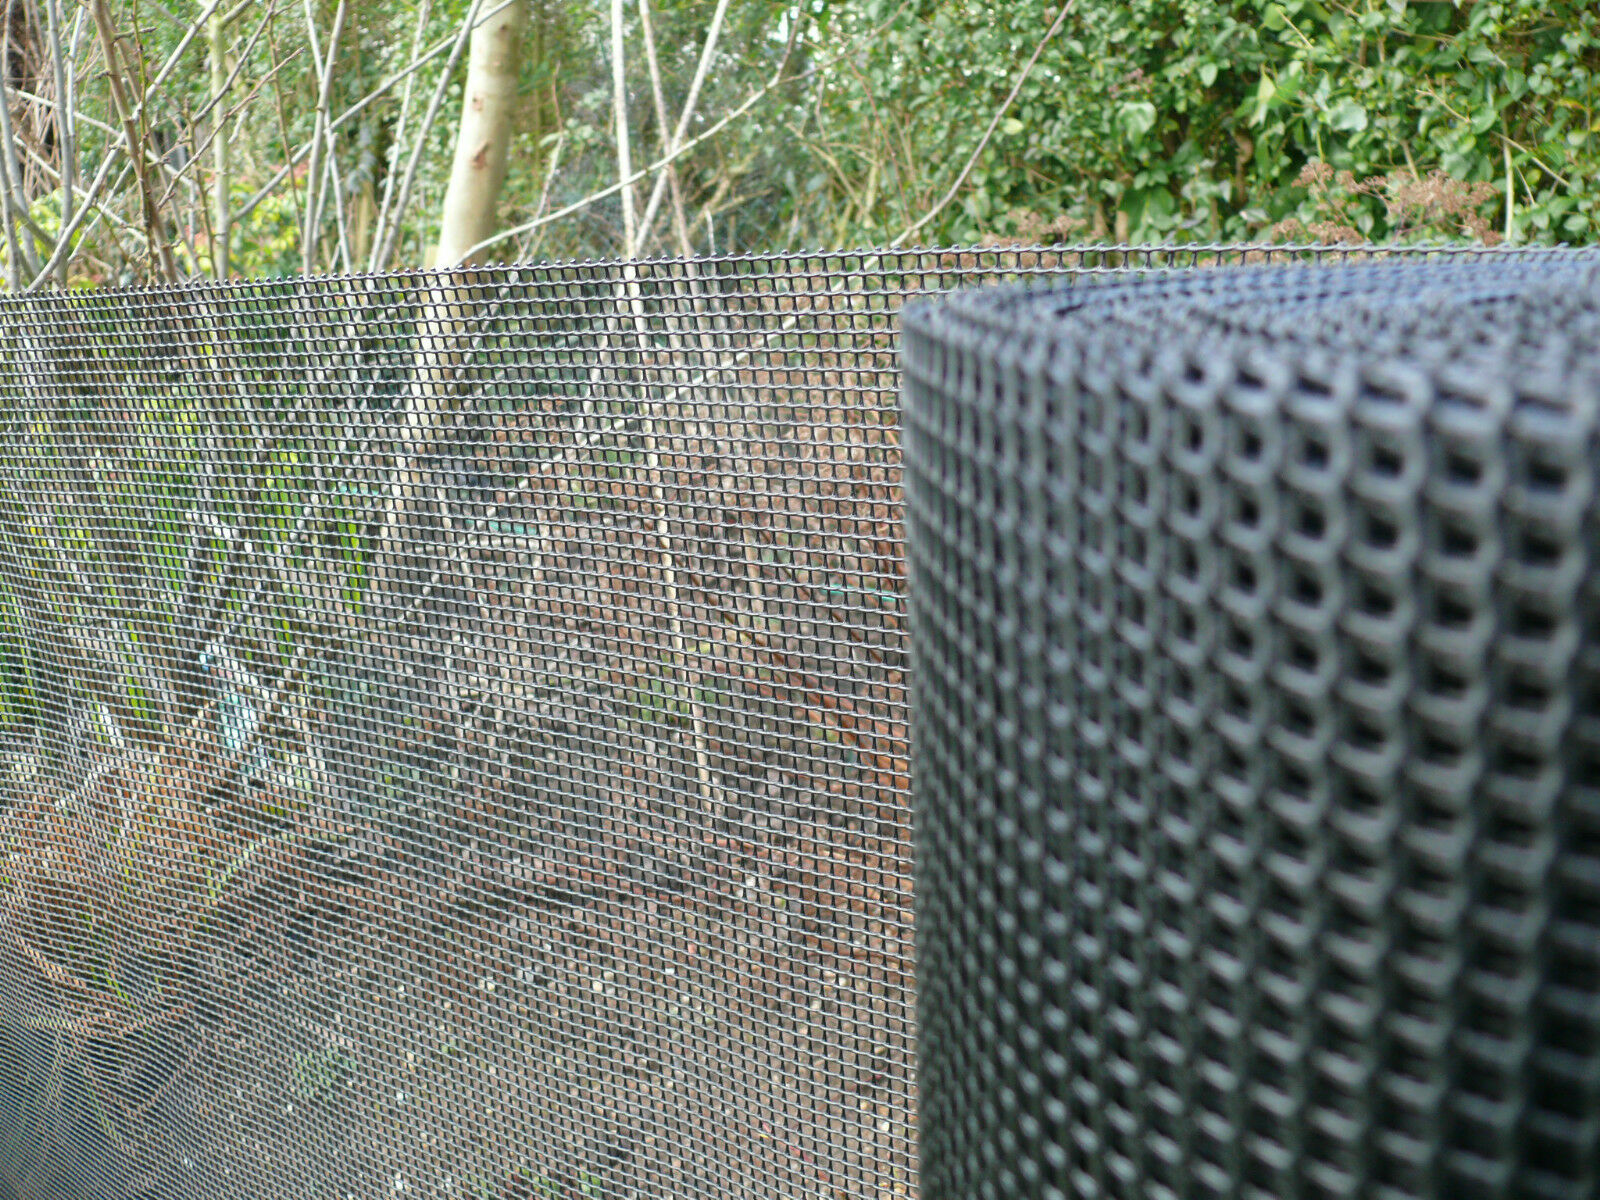 Garden Fencing Mesh 5 Mm Hole Black